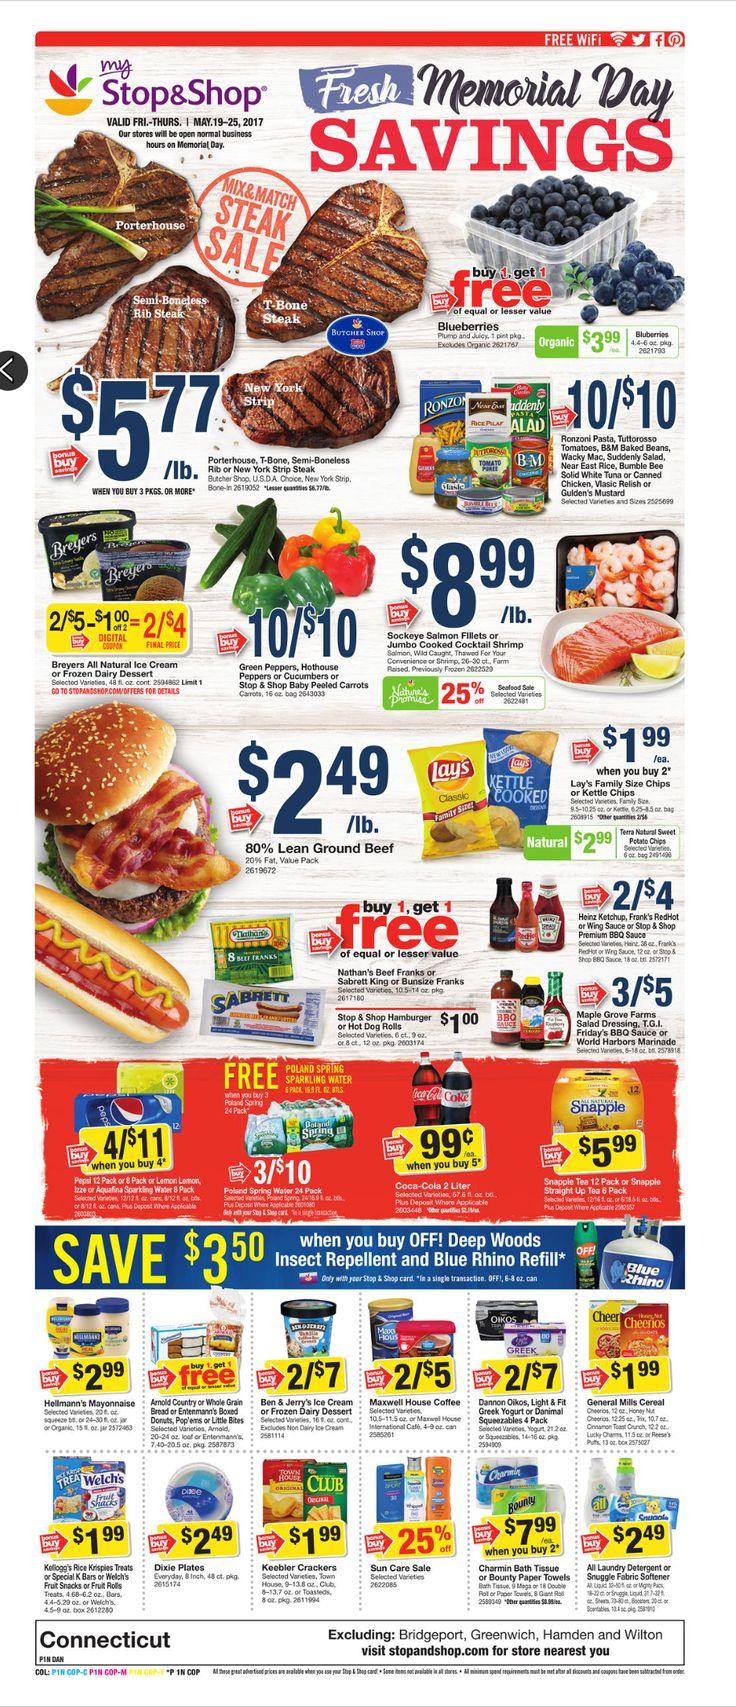 Stop and Shop Circular May 19 - 25, 2017 - http://www.olcatalog.com/grocery/stop-and-shop-circular.html